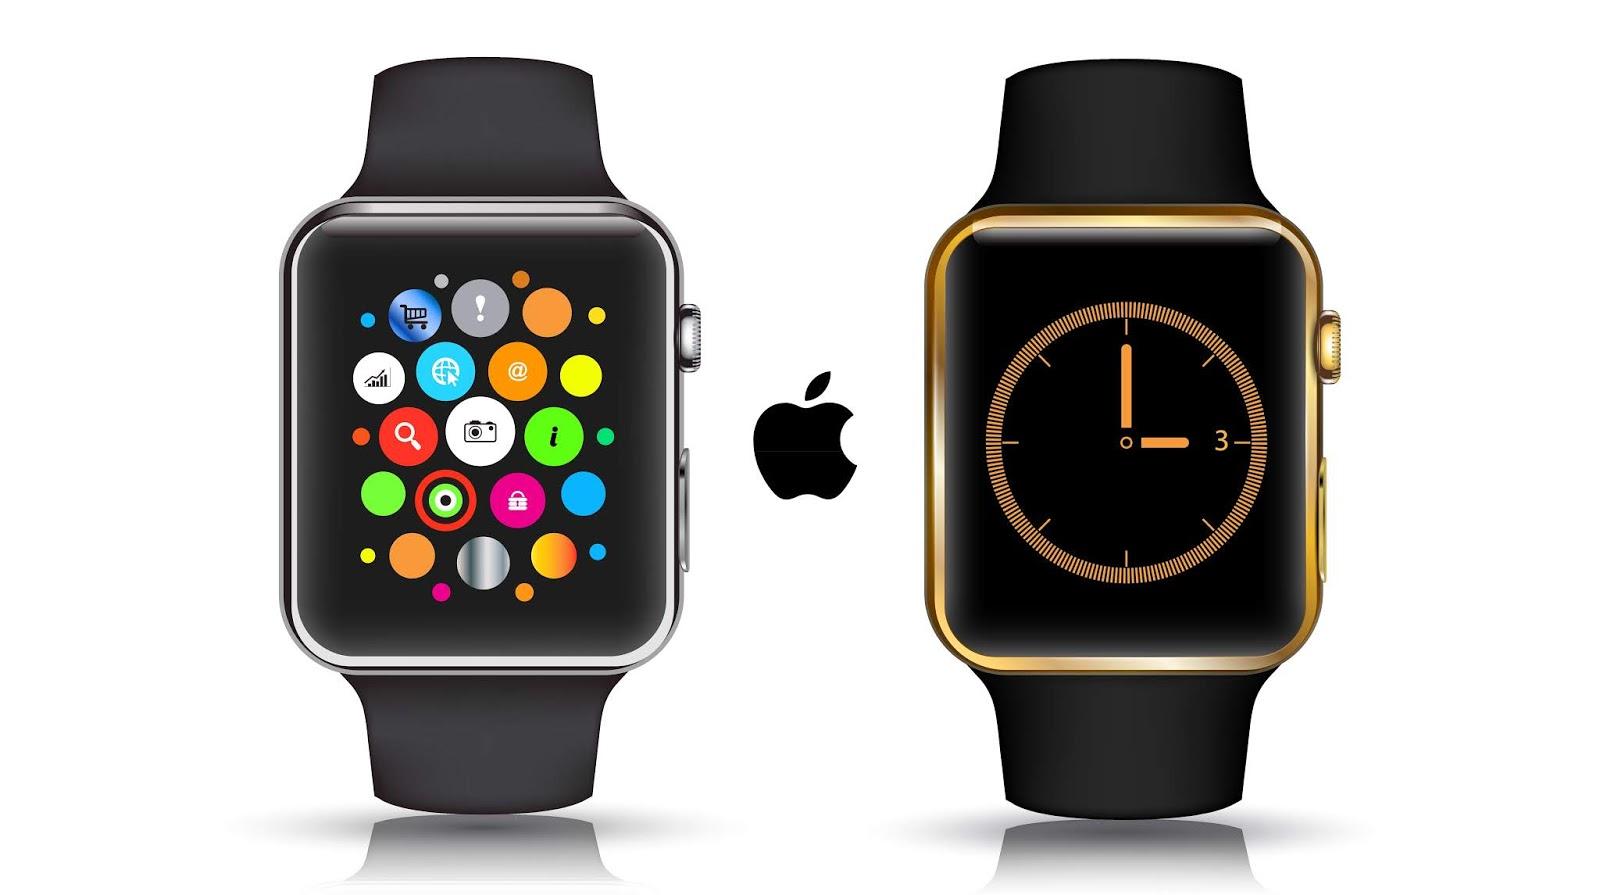 Watch, Futuristic Gadgets image